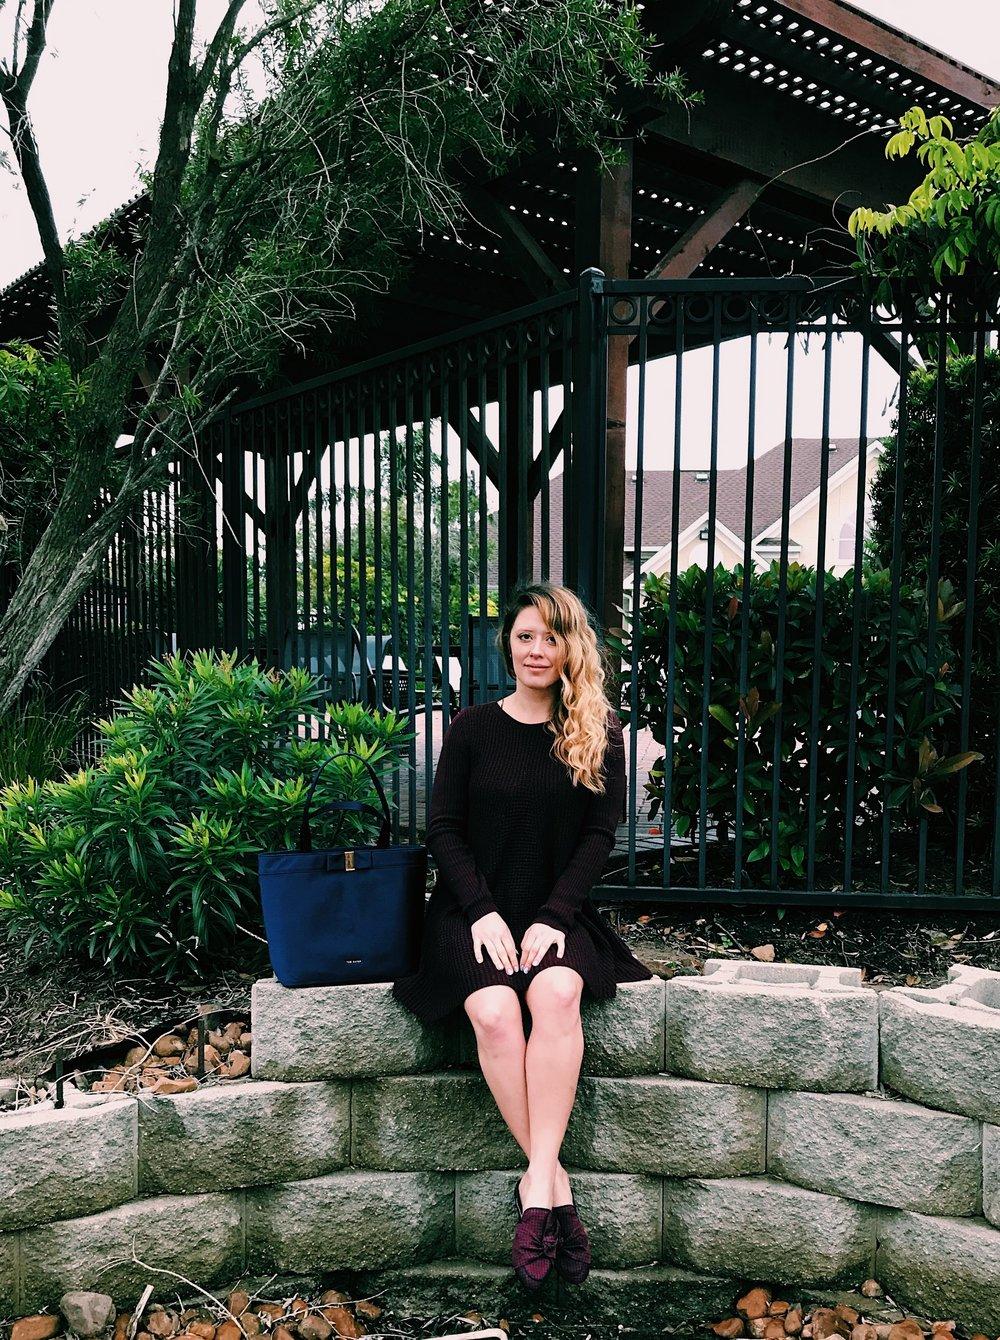 Three Heel Clicks - Sweater Dress with Mules (15).jpg